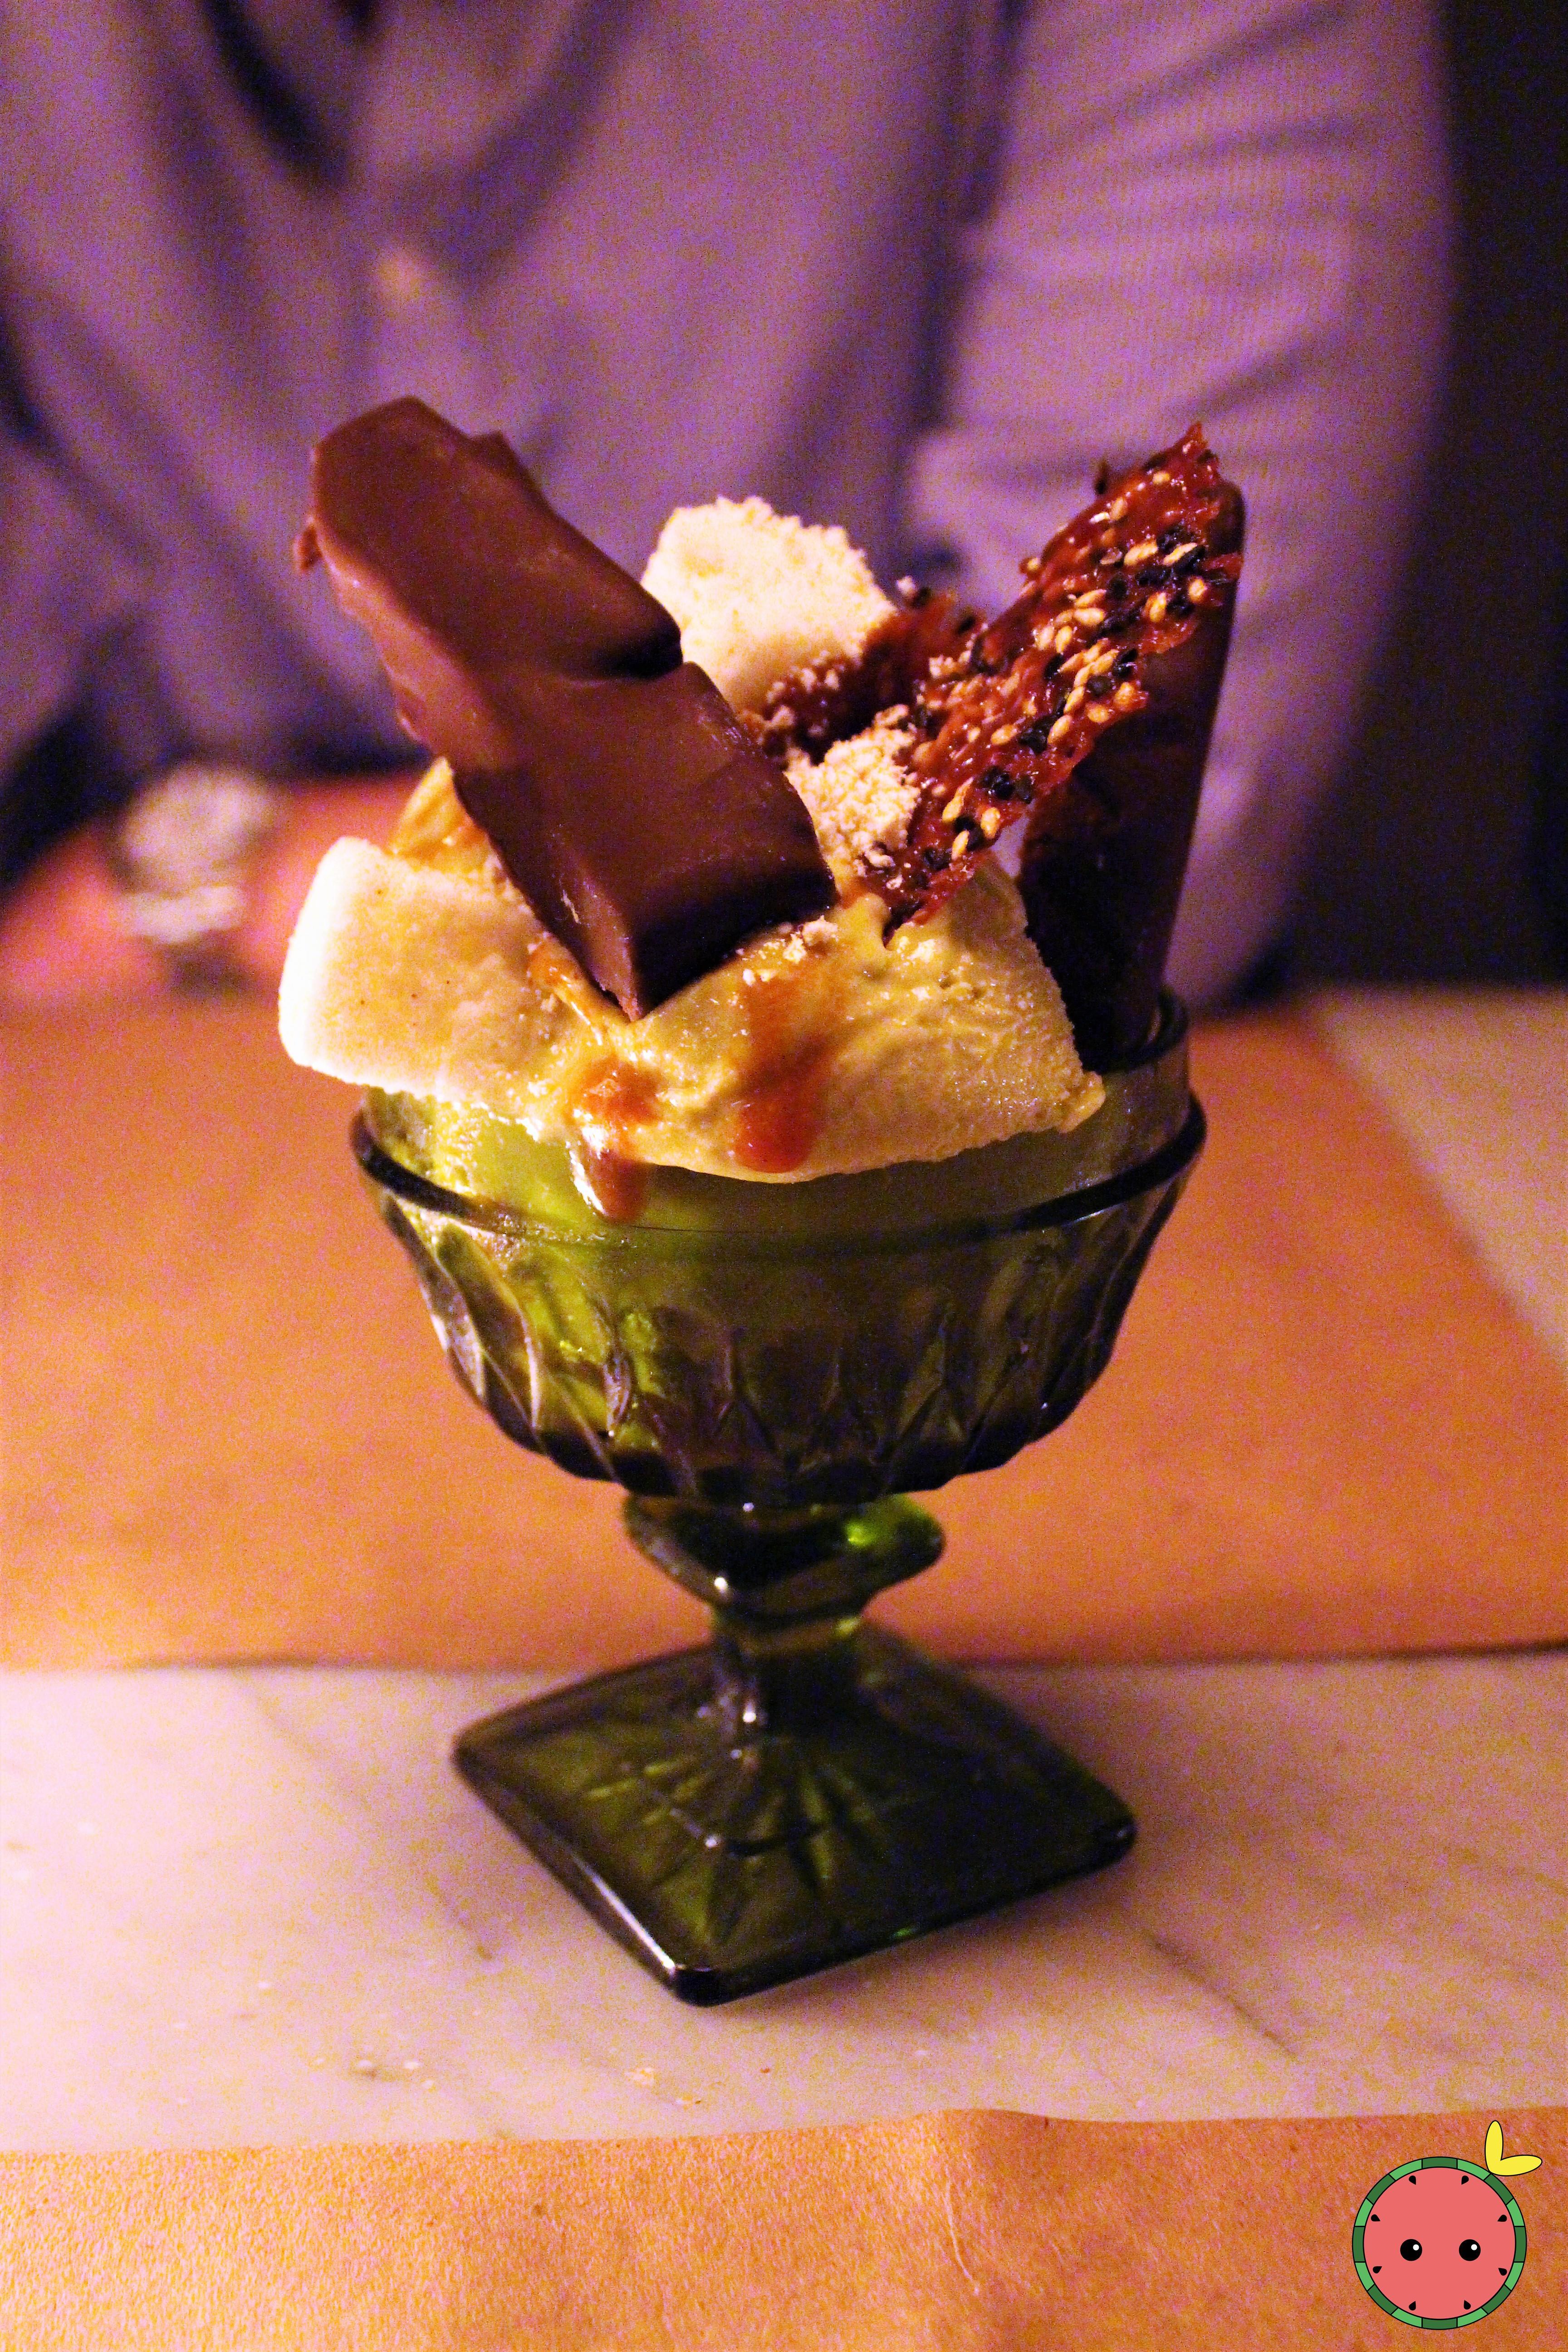 Matcha Sundae - Matcha ice cream, miso caramel sauce, fudge, homemade kit kat, more delicious stuff